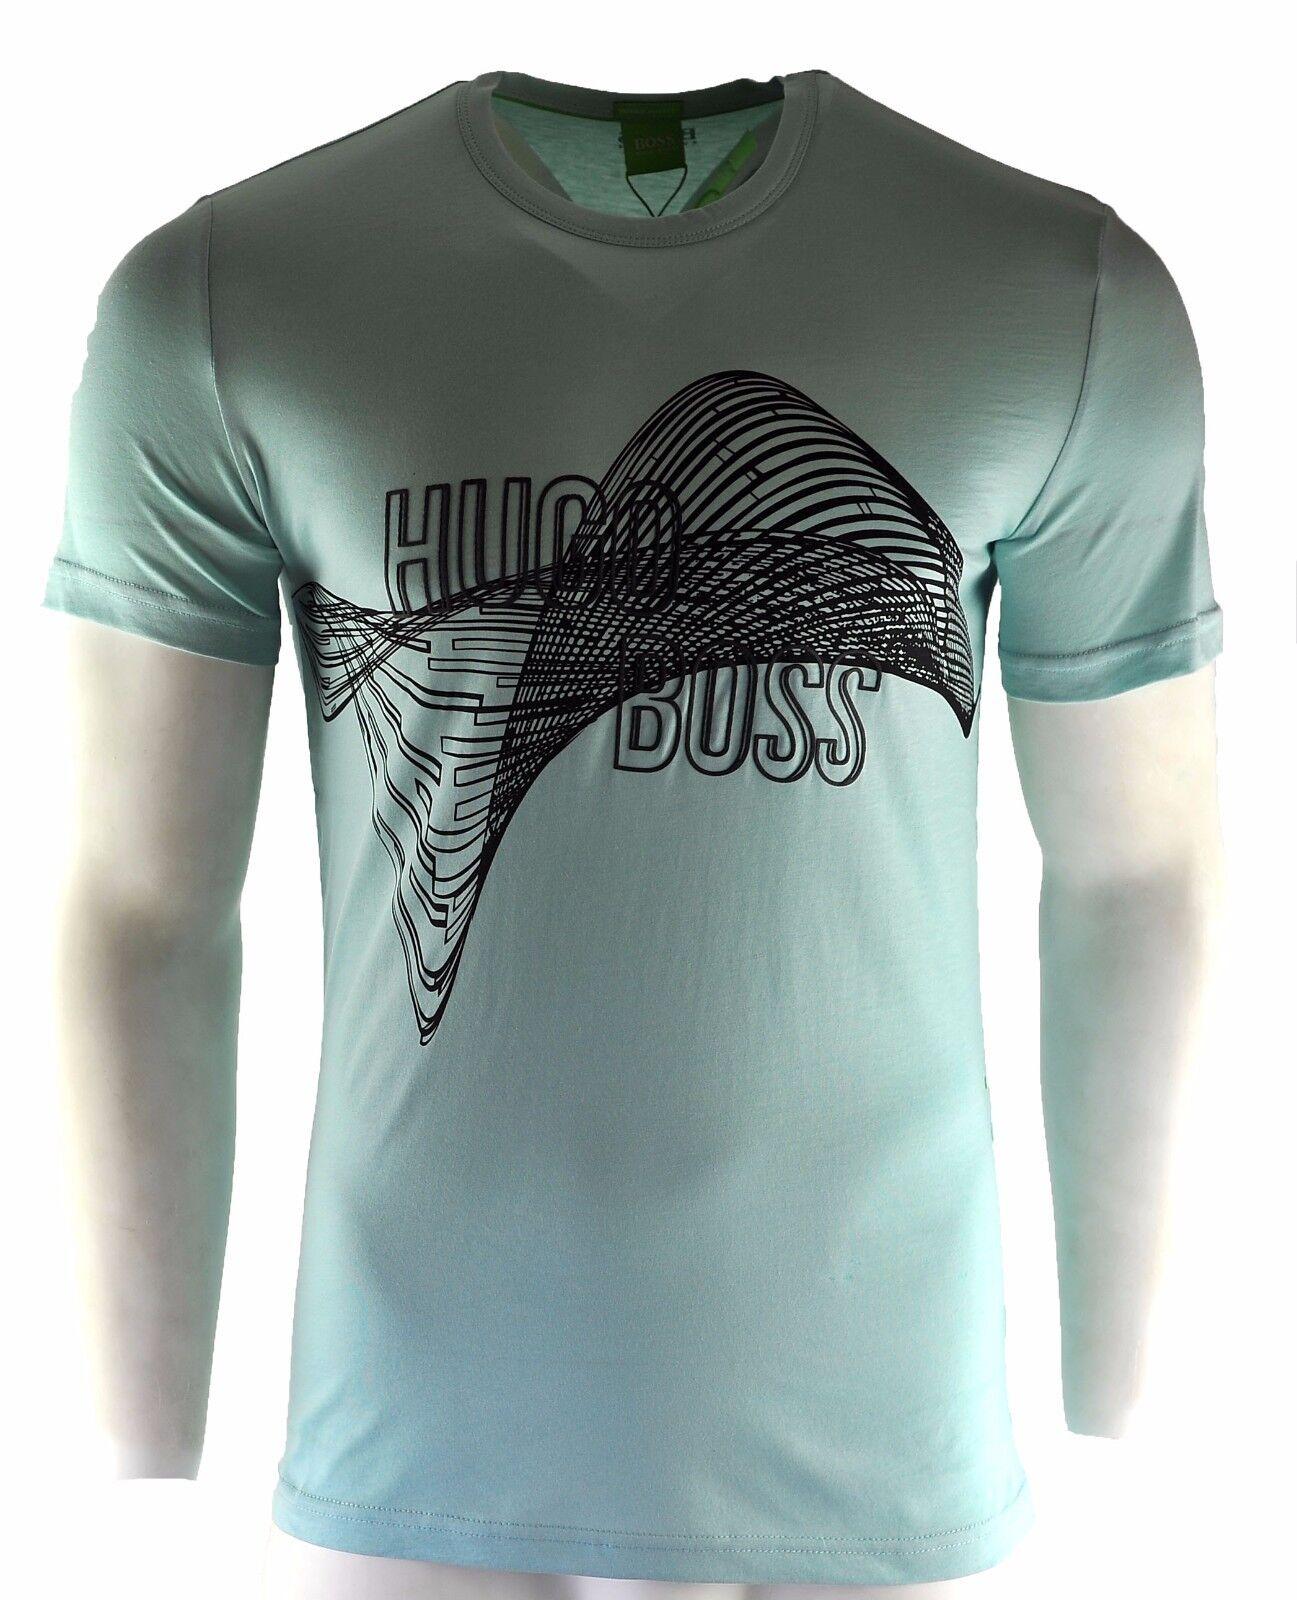 Homme HUGO BOSS BOSS BOSS t-shirt bleu à la mode ras du cou taille S M L XL XXL 7c70e1